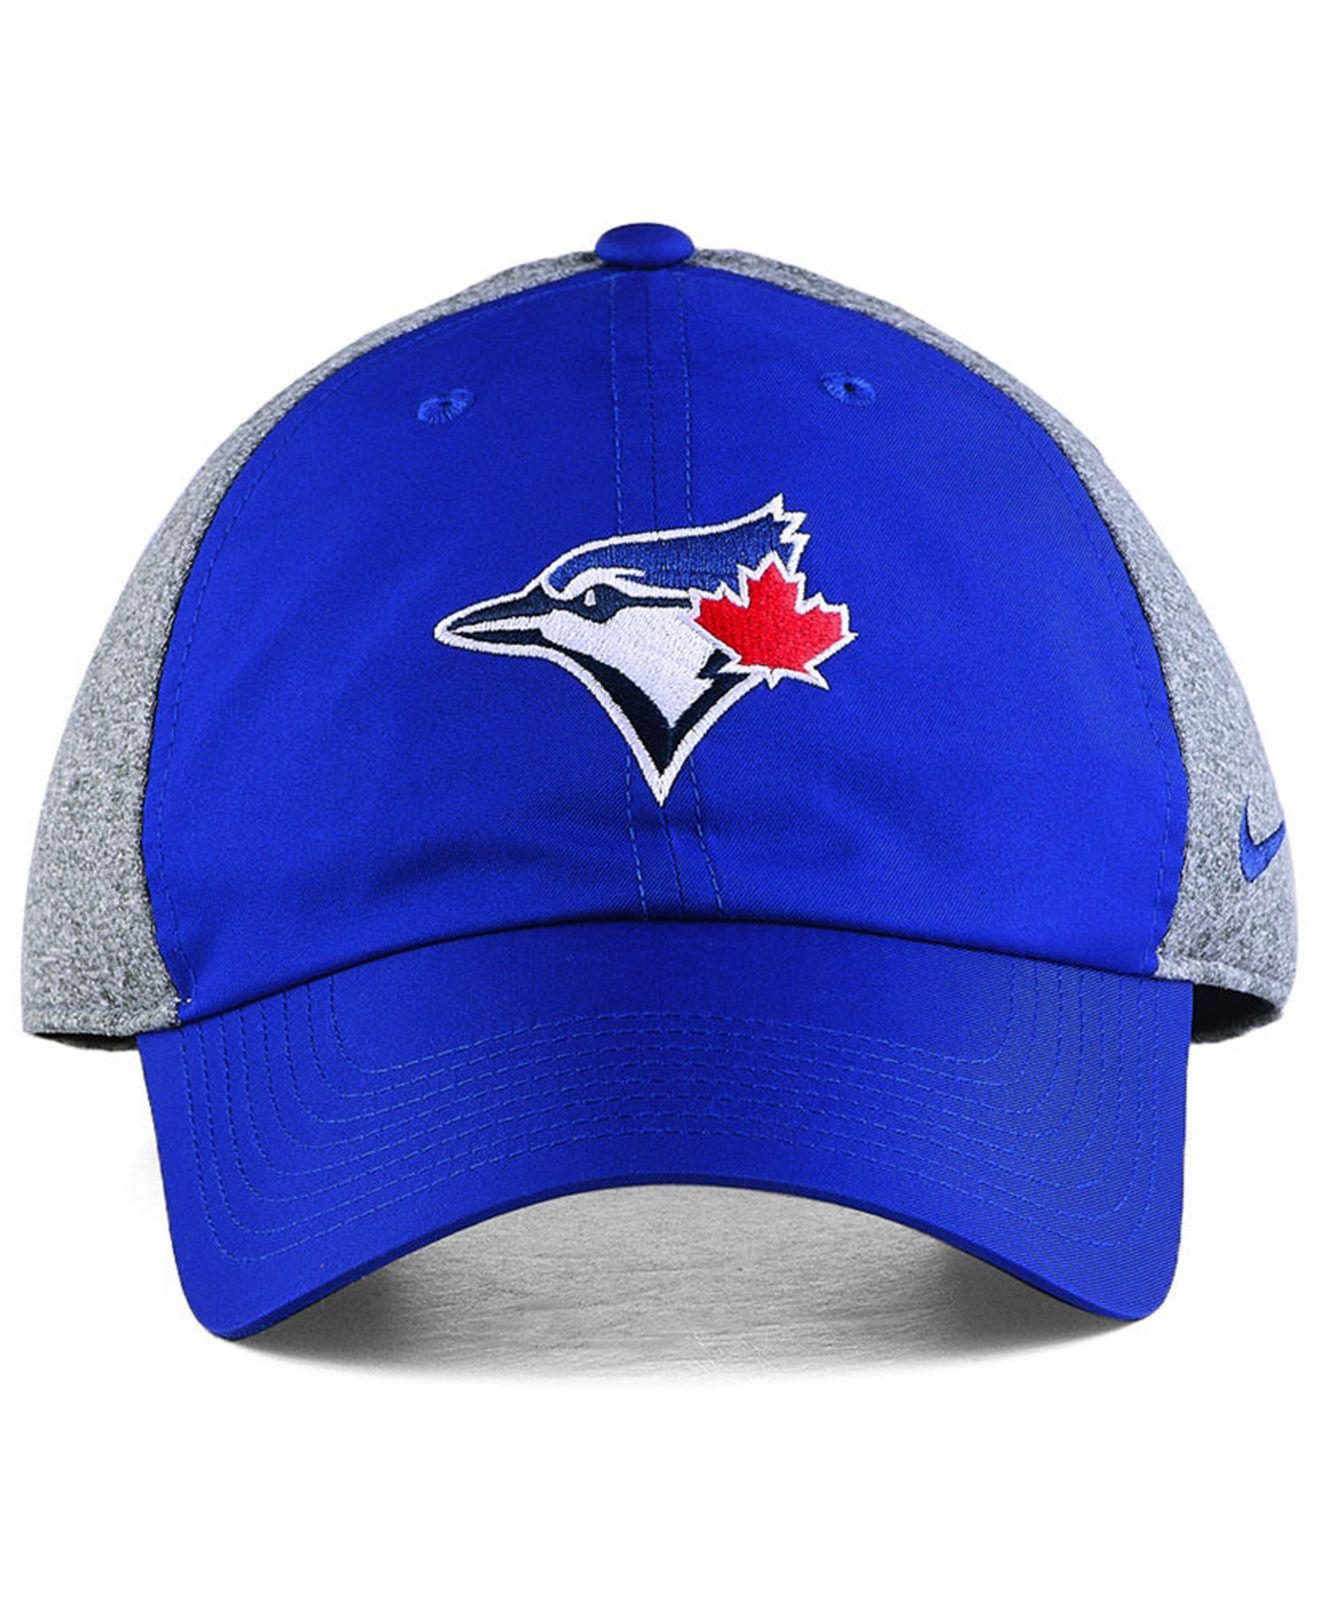 6b1a89b0df4 Lyst - Nike Toronto Blue Jays New Day Legend Cap in Blue for Men